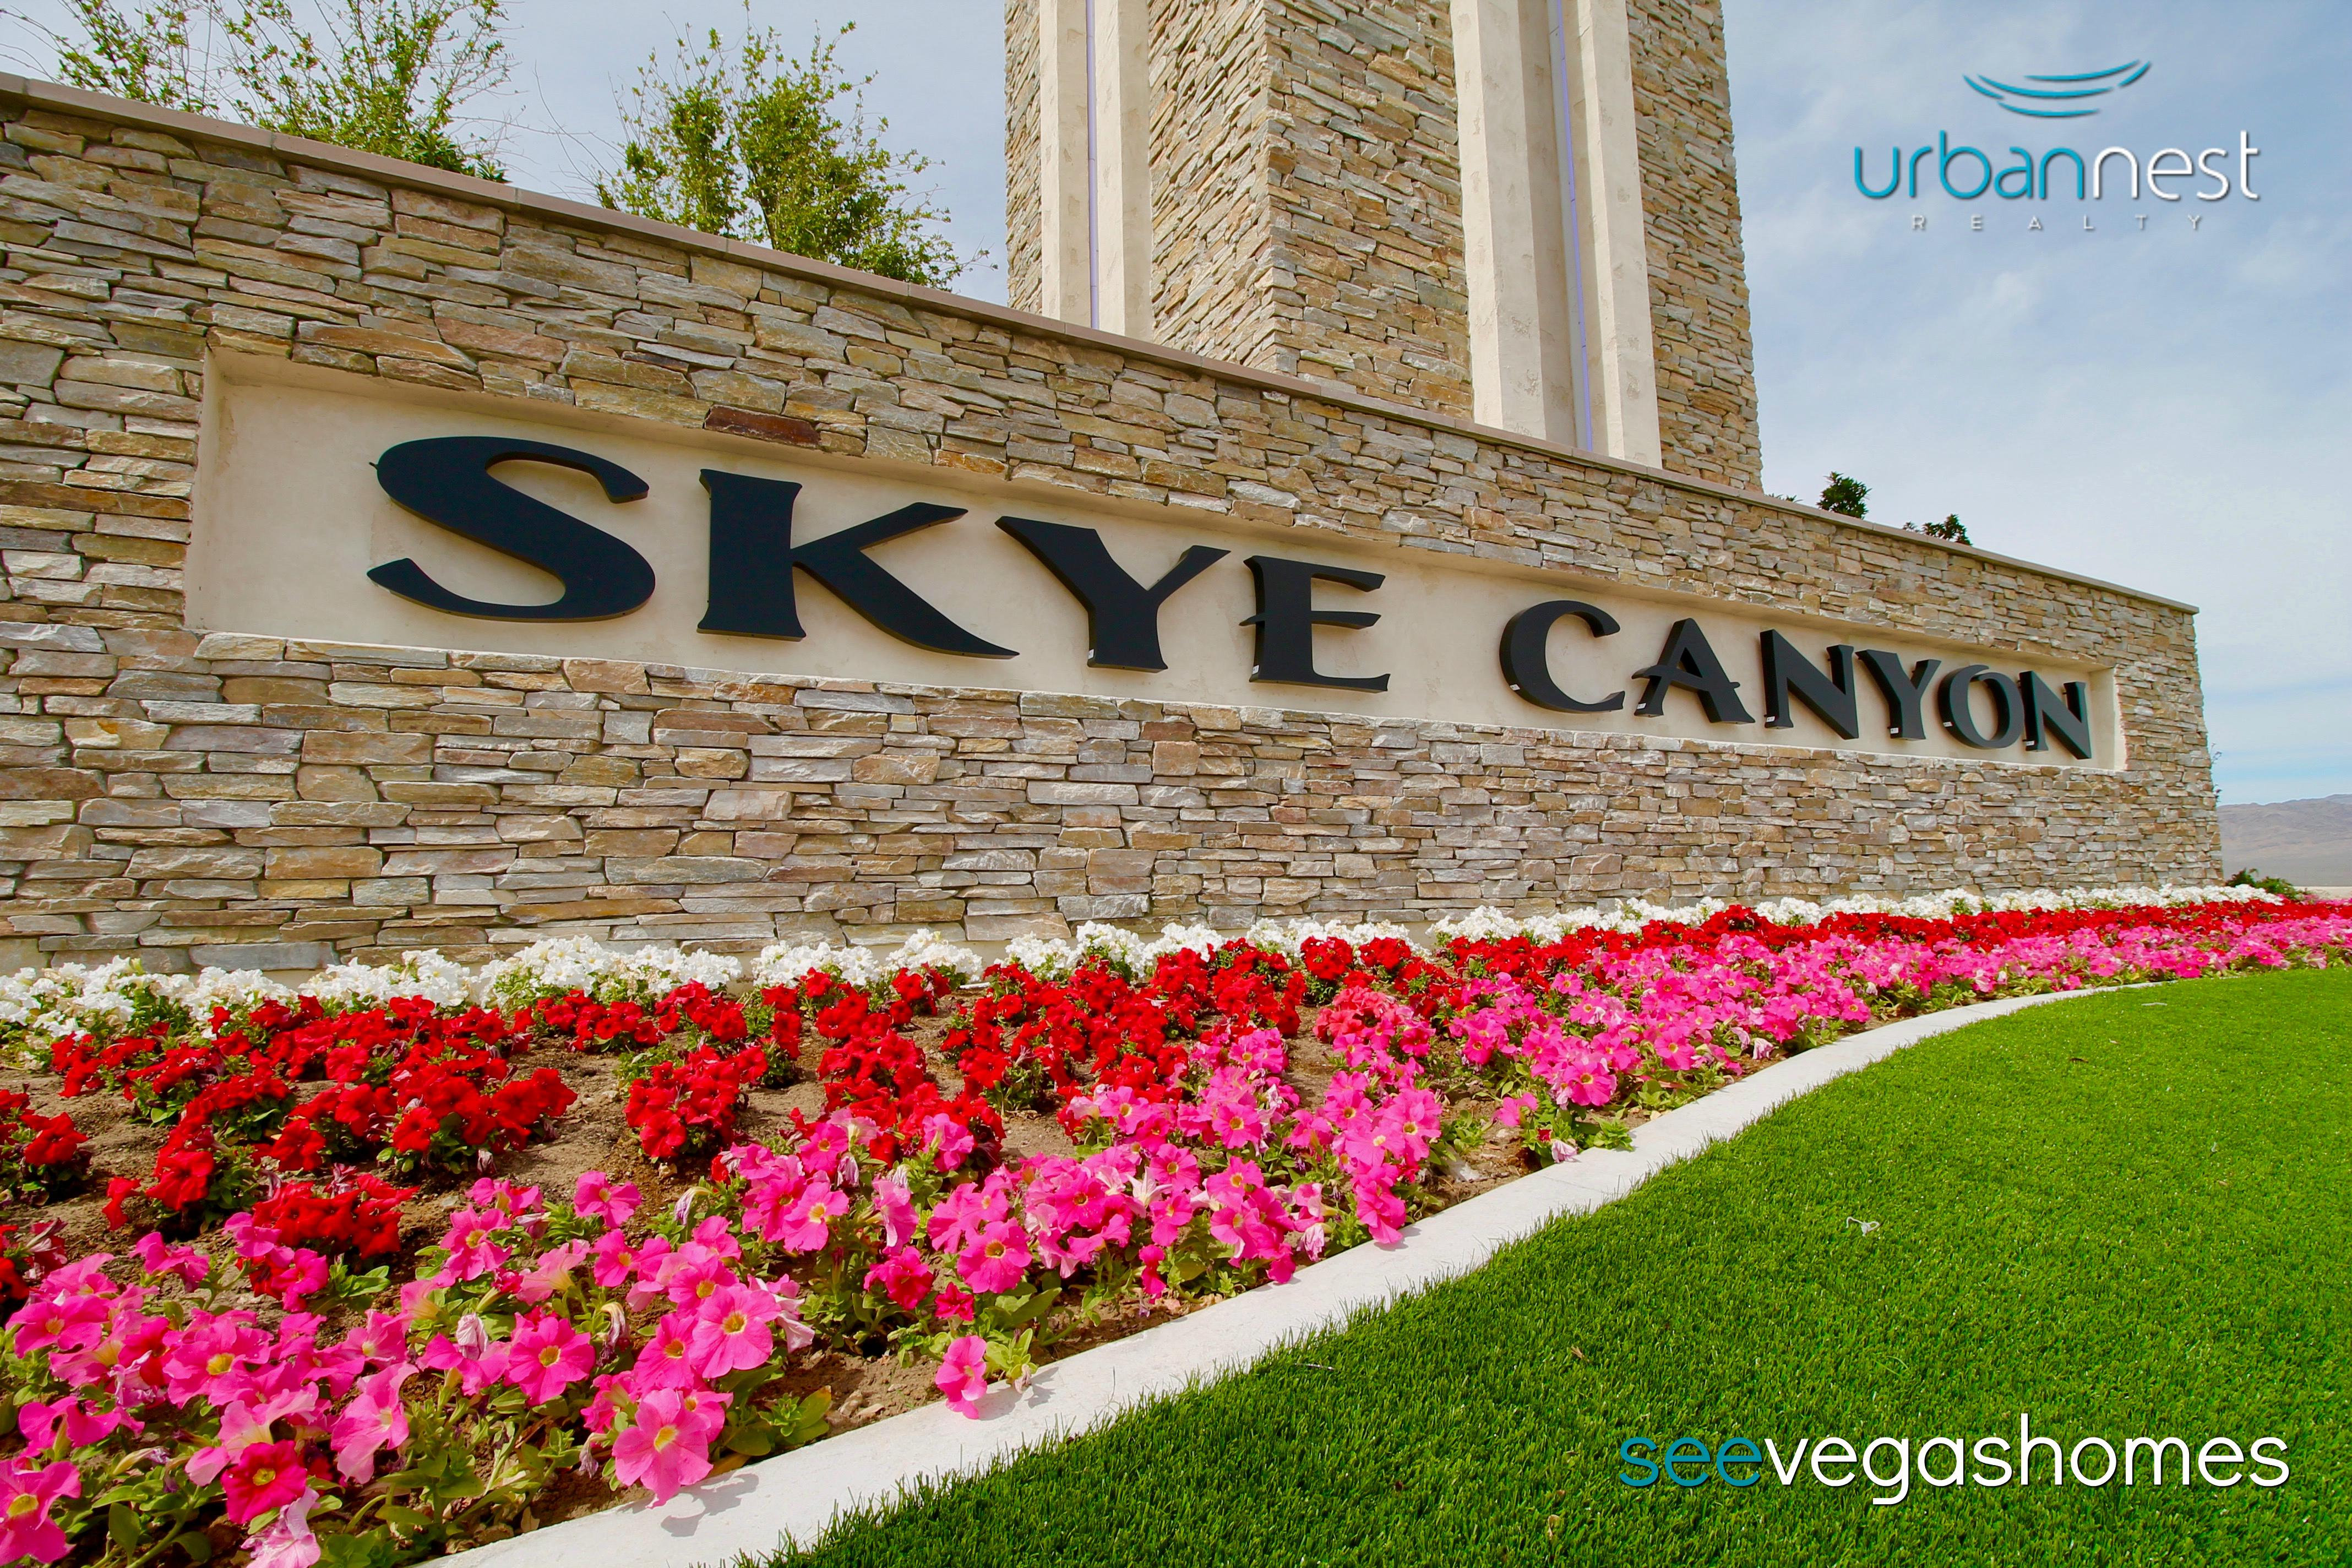 Skye Canyon Las Vegas NV 89166 SeeVegasHomes